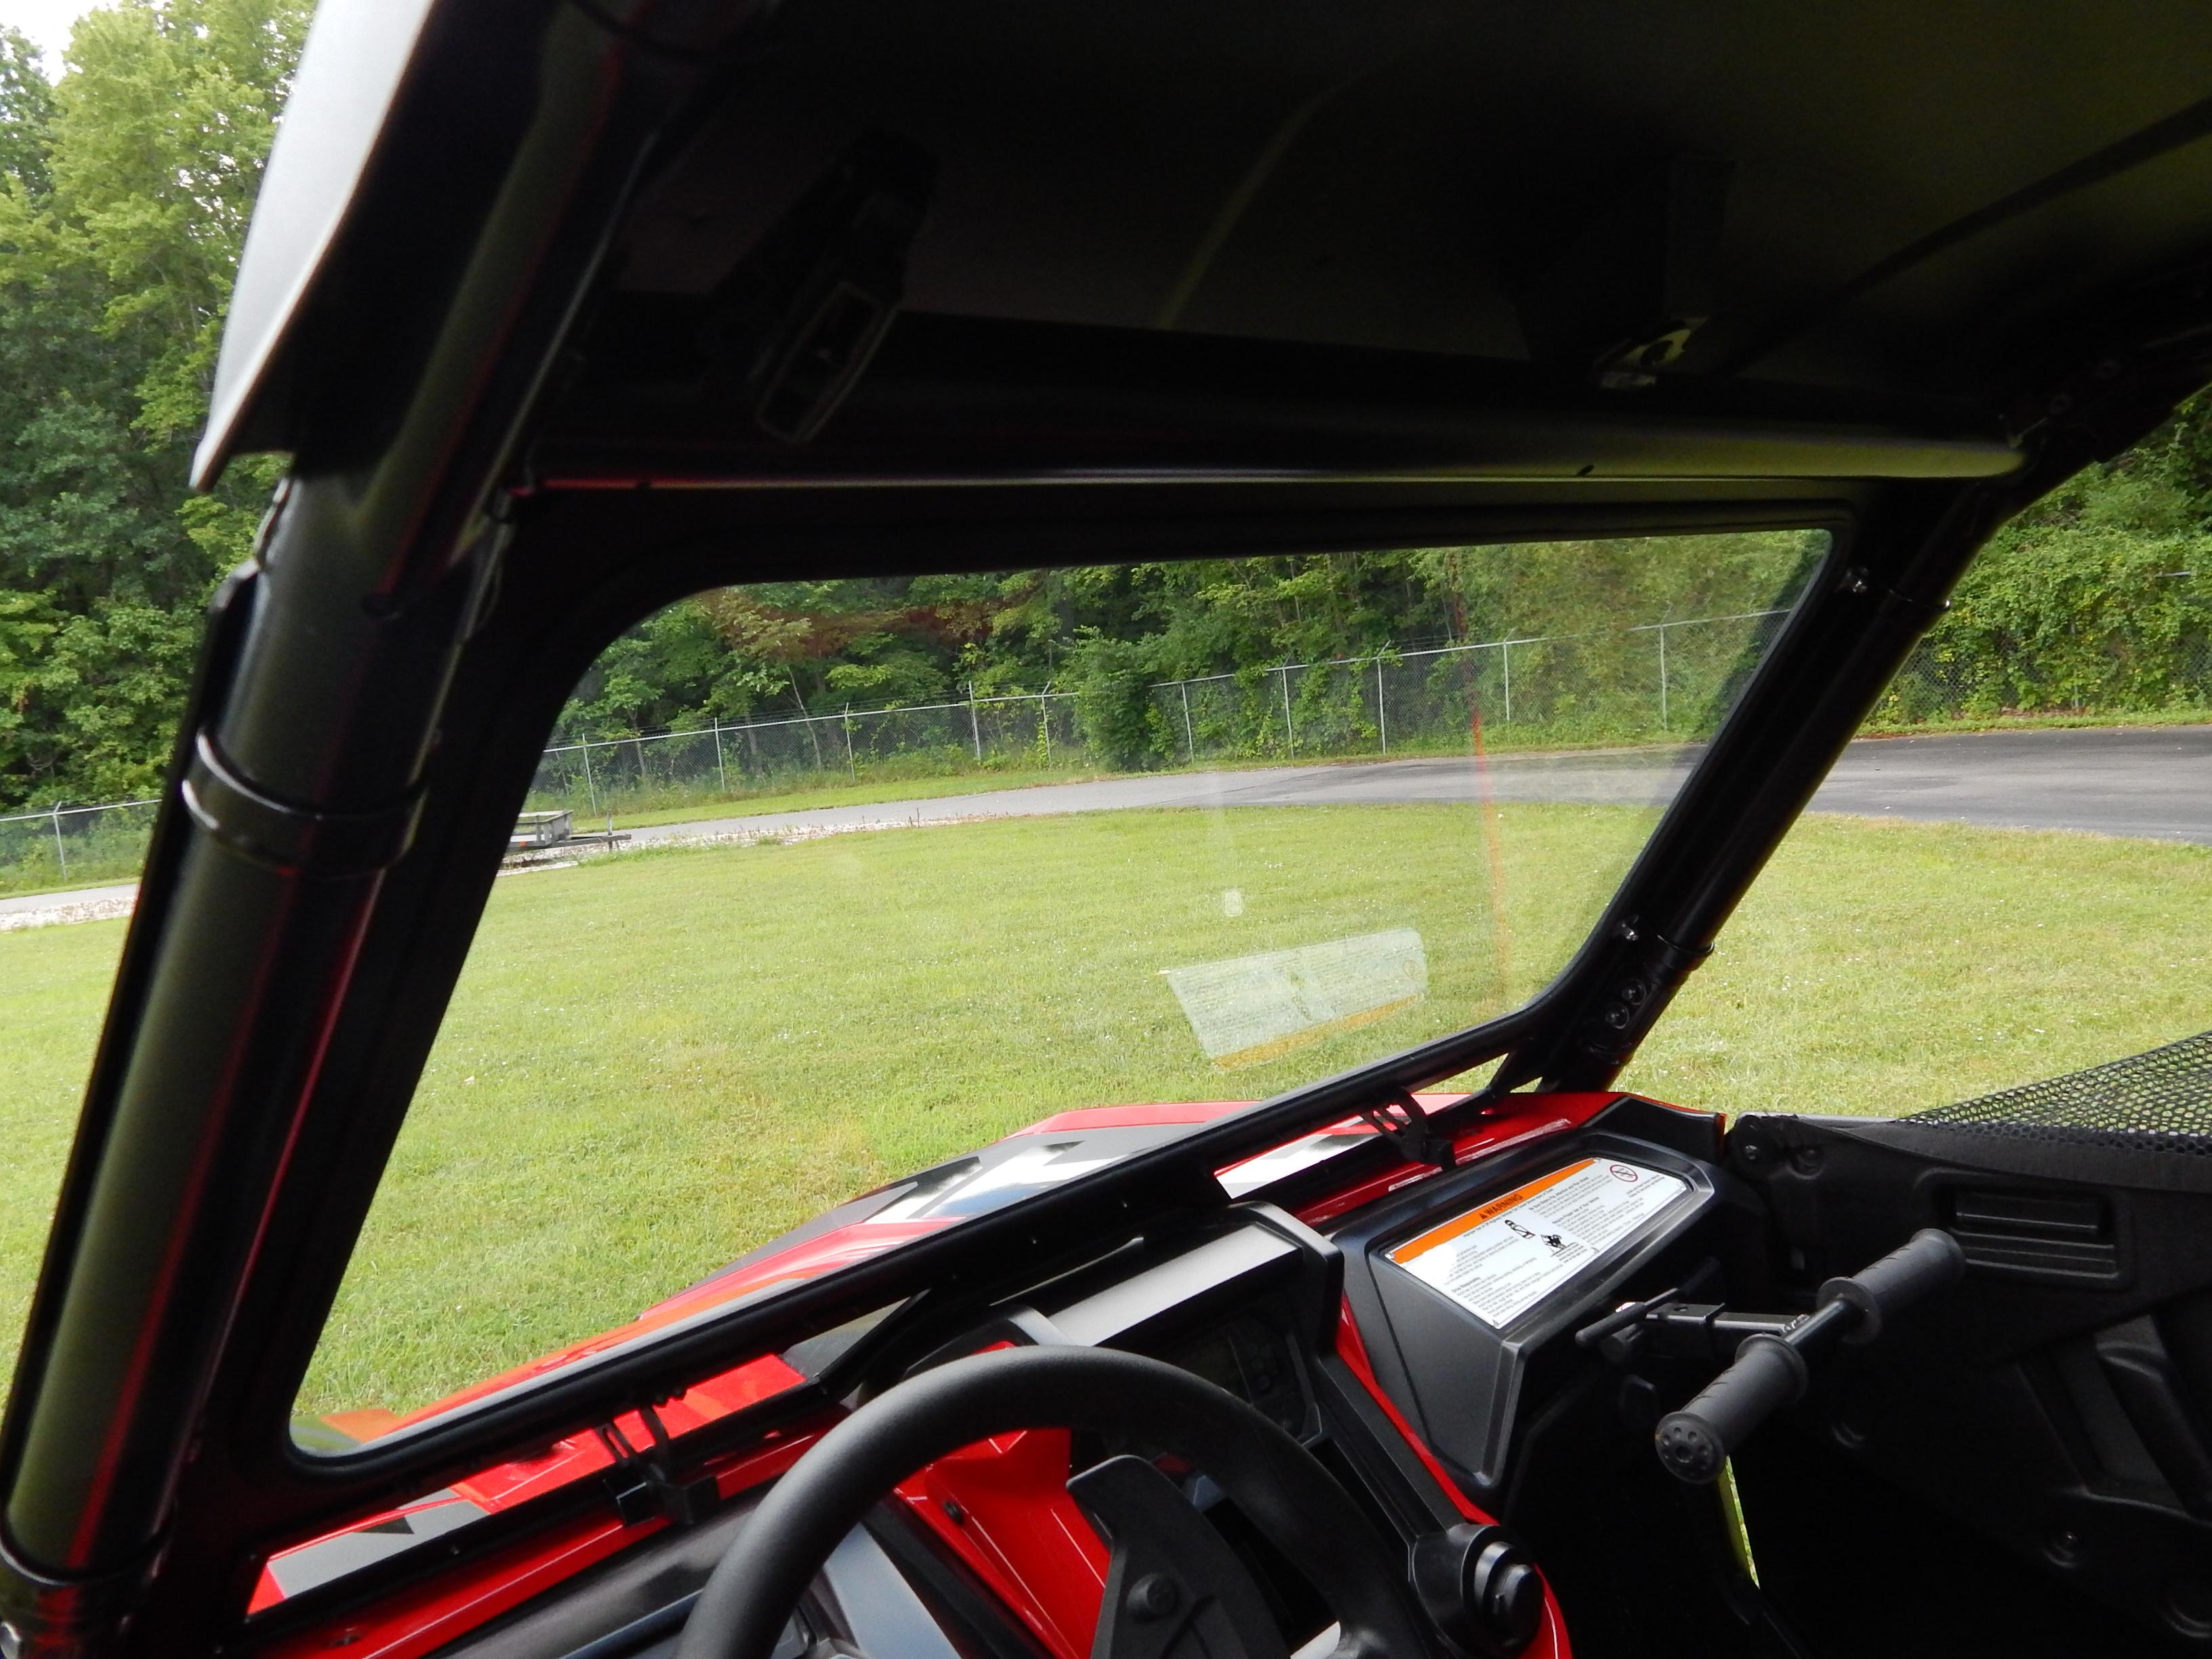 Honda Talon 1000x Vented Glass Windshield Axiom Side By